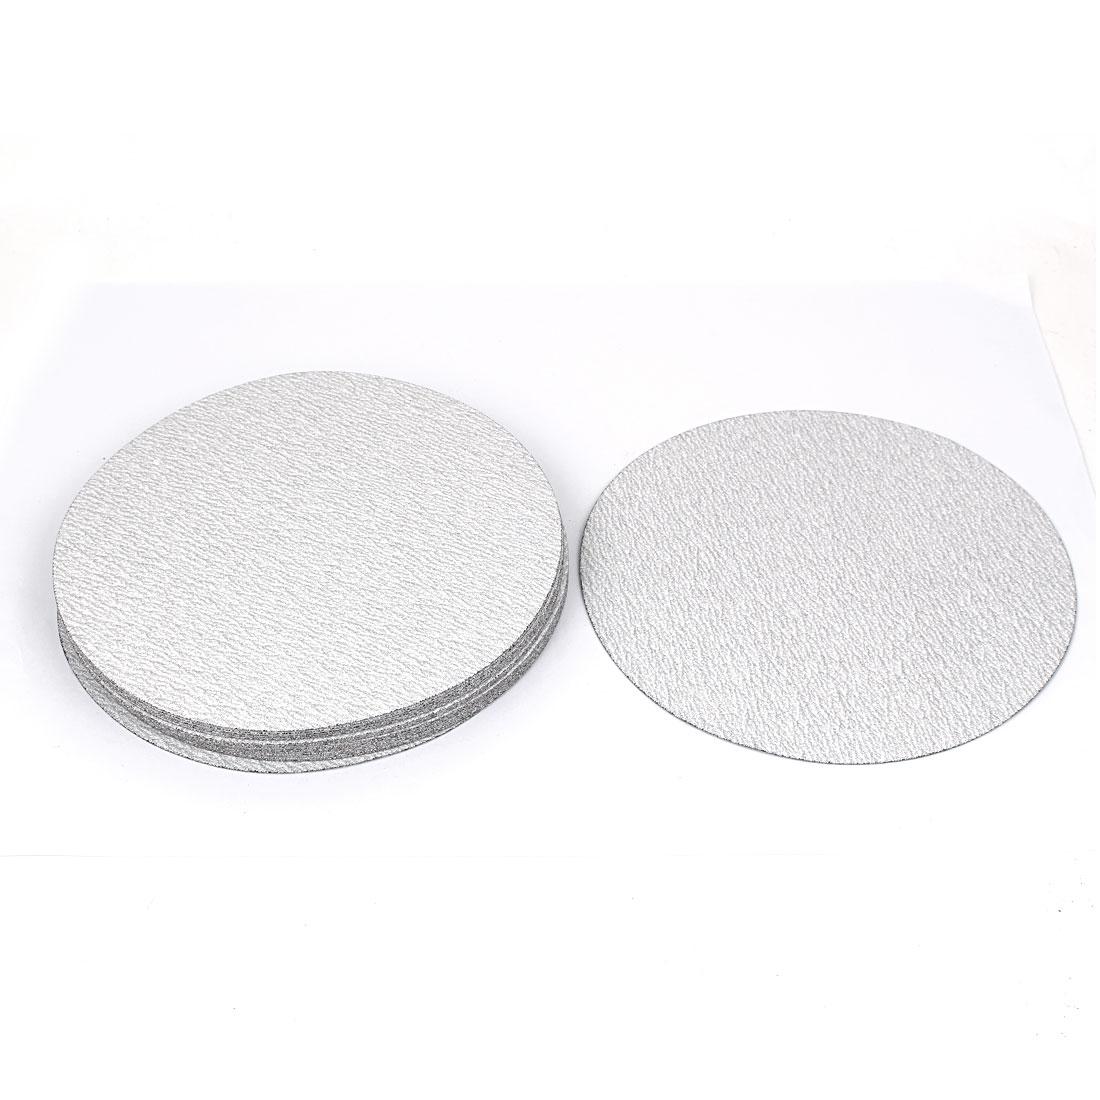 7inch Dia Round Dry Abrasive Sanding Flocking Sandpaper Disc 180 Grit 20pcs